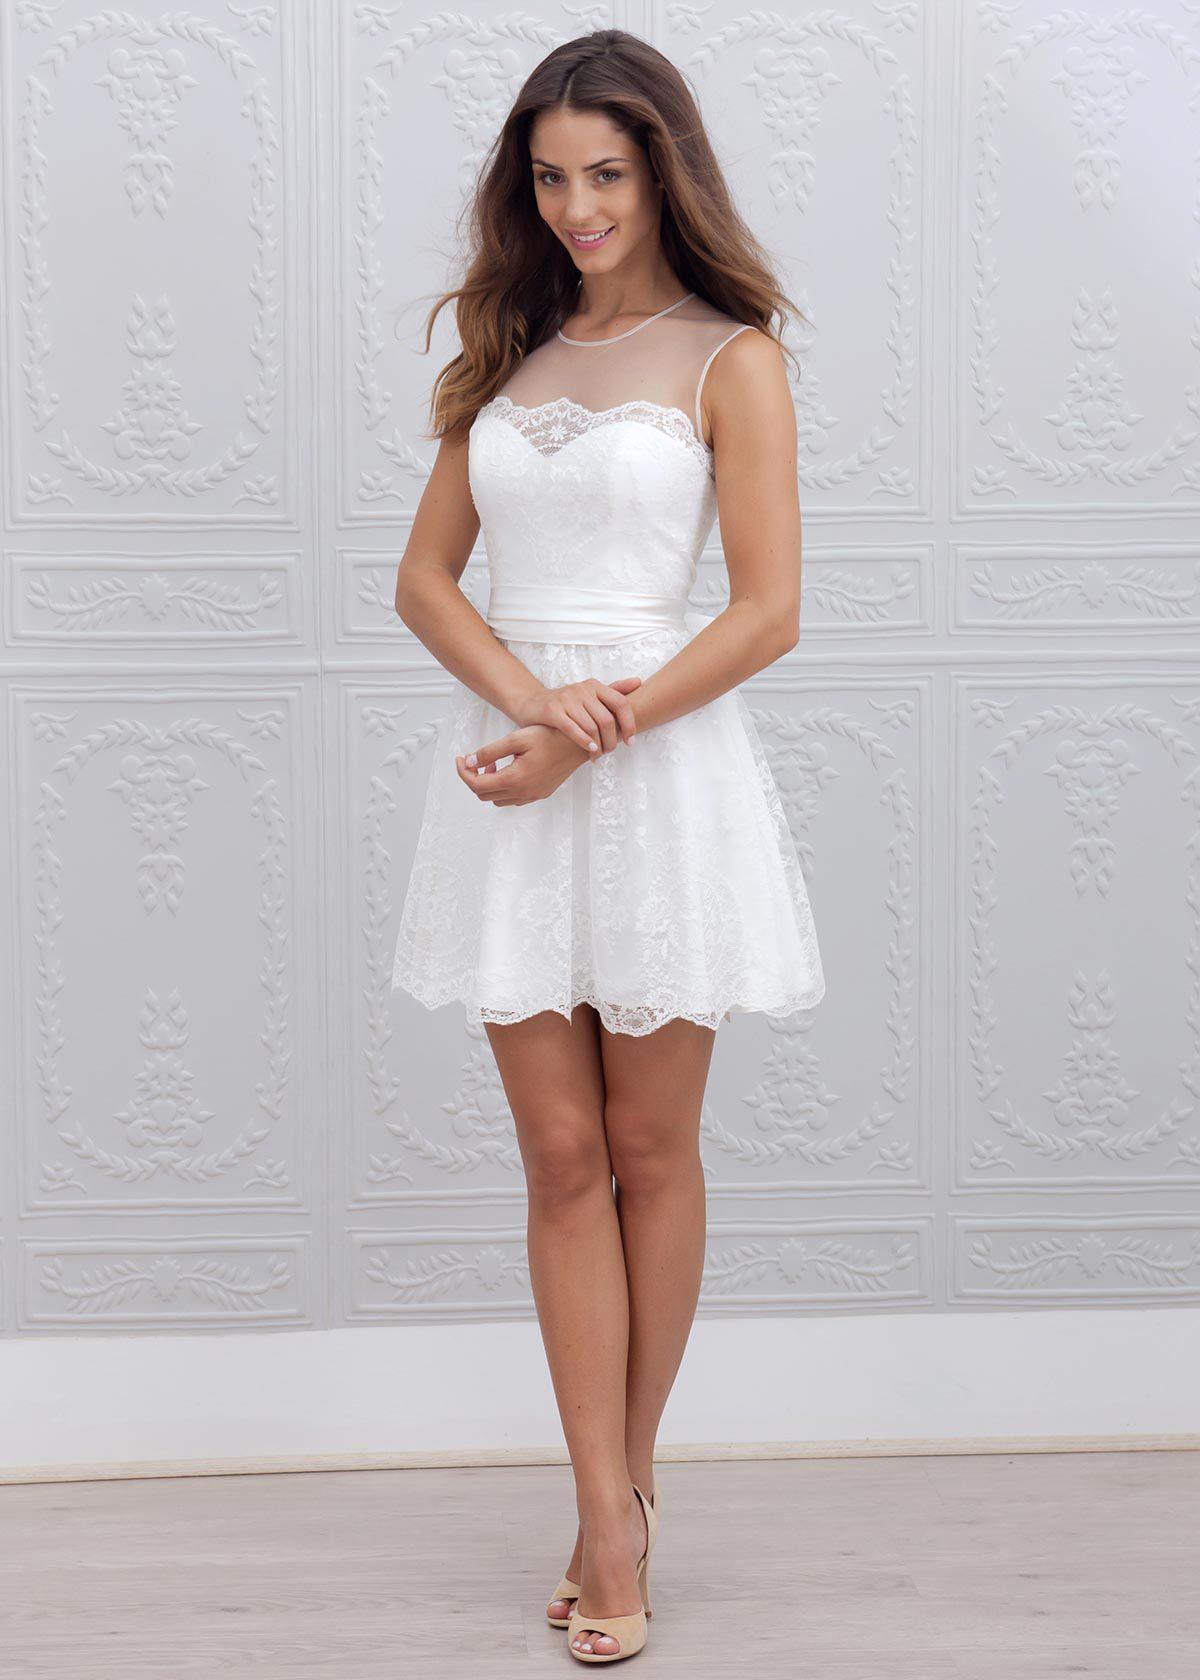 Ivory Lace Sheer Back Short Wedding Dress in 2020